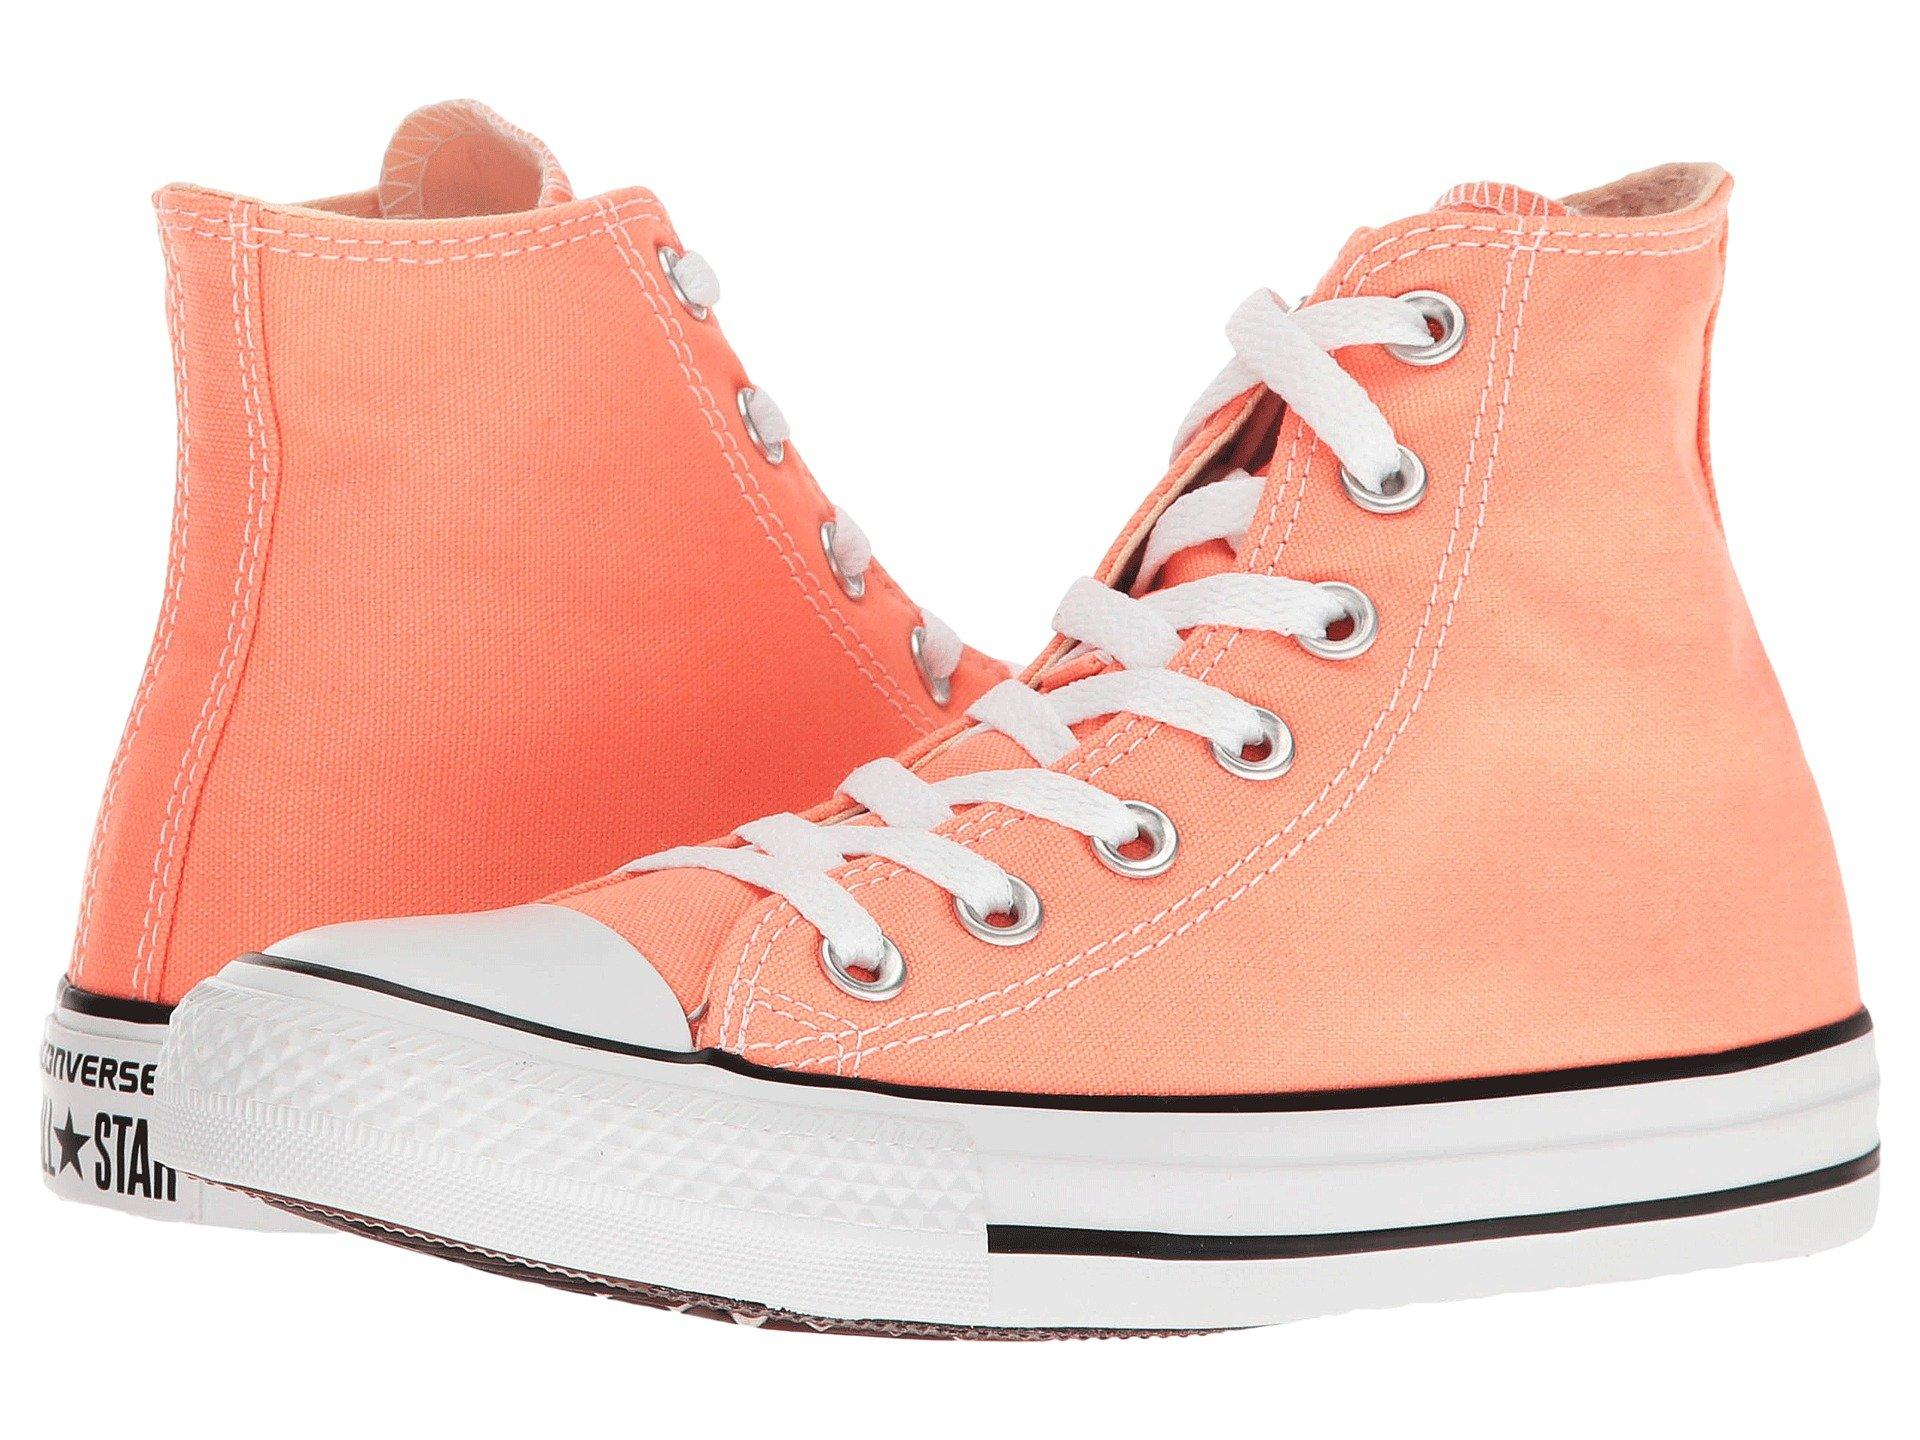 0194ba899272 Converse Chuck Taylor® All Star® Seasonal Color Hi